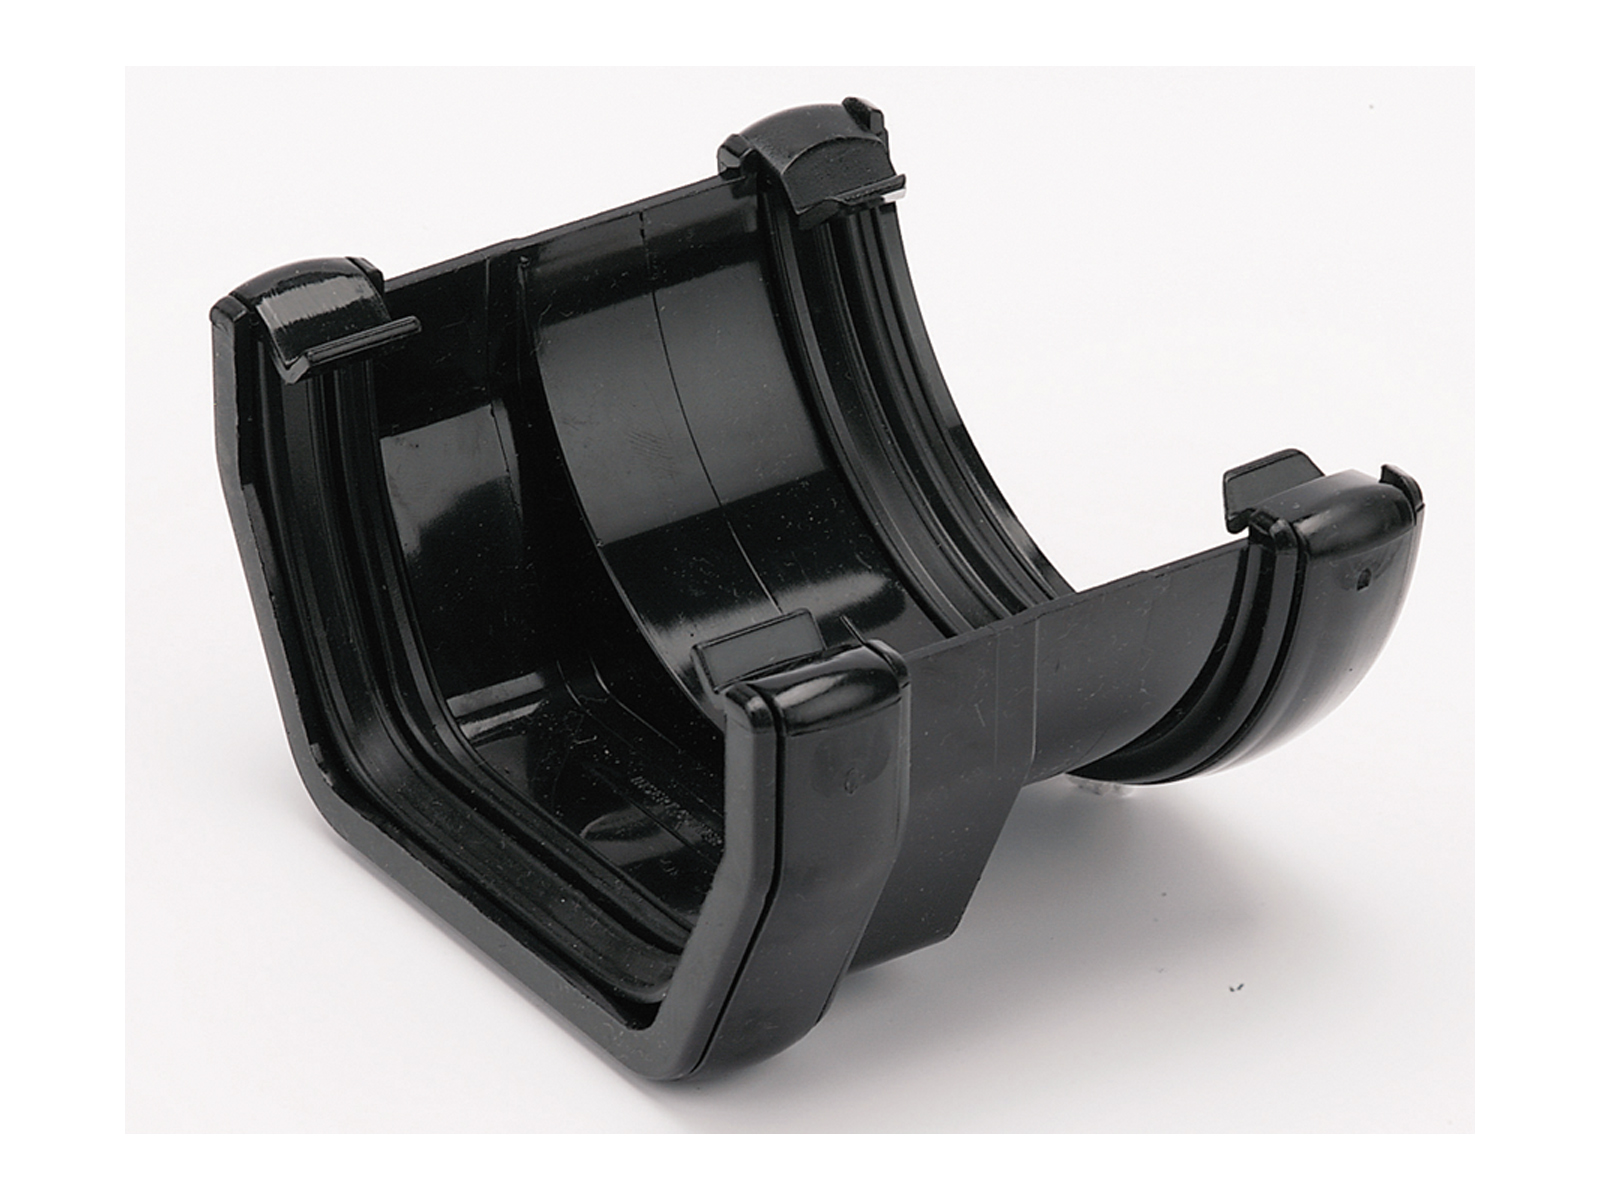 Floplast RDS1BL 114mm Square Line to 112mm Half Round Gutter Adaptor - Black